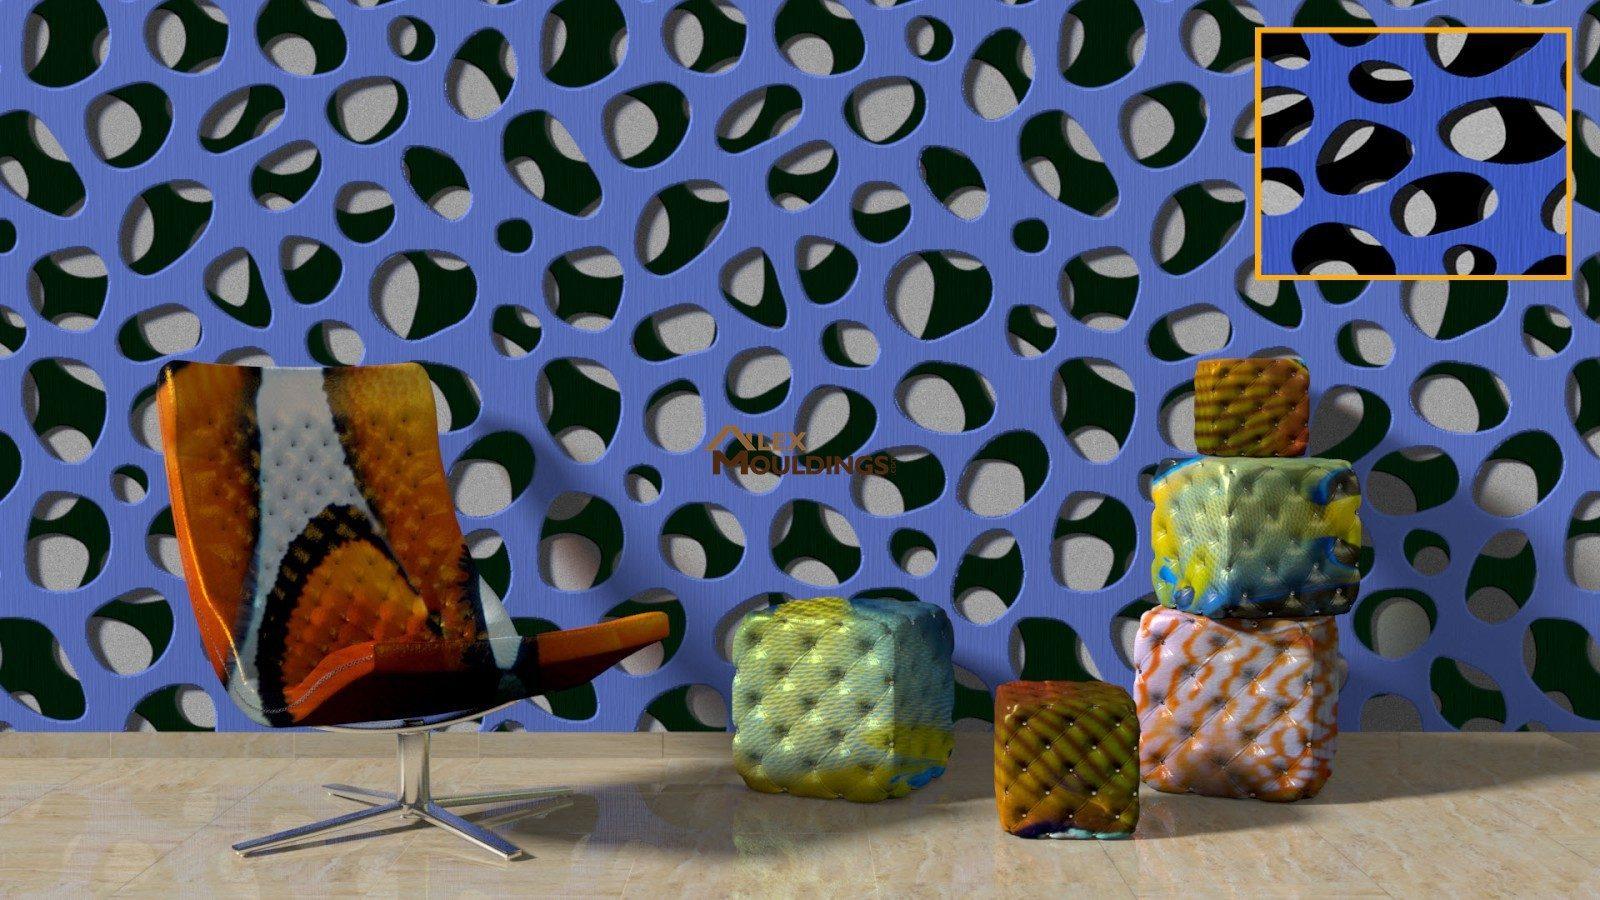 3D organica screen paneling